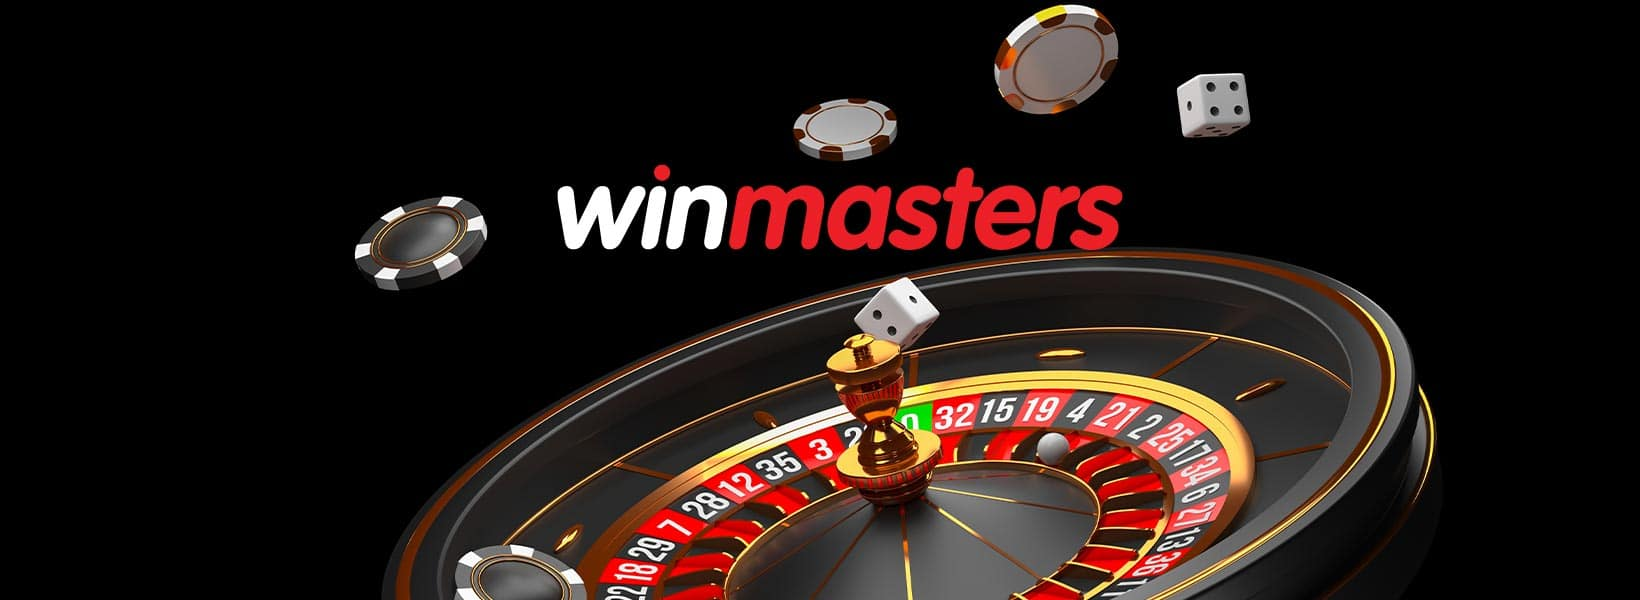 winmasters ruleta online gratis